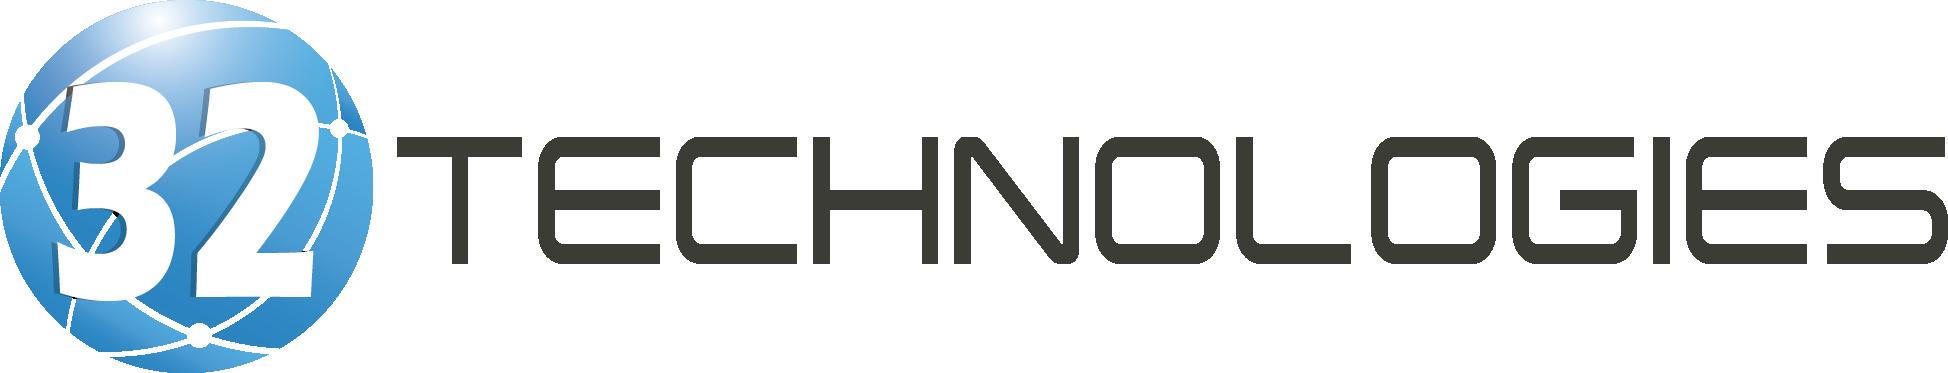 32 Technologies